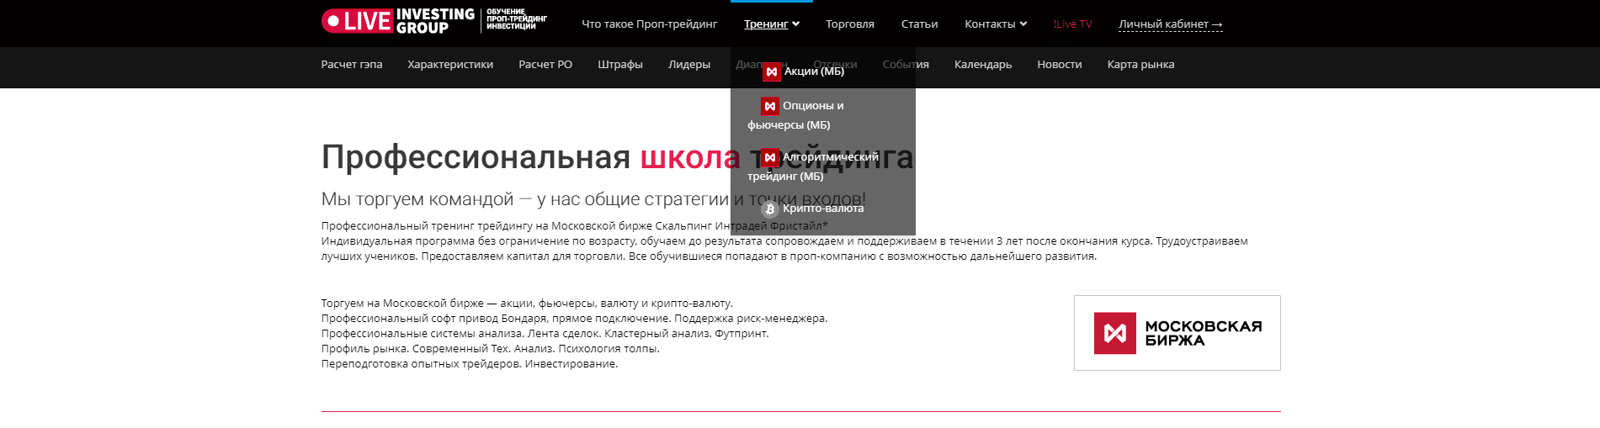 Сергей Алексеев сайт